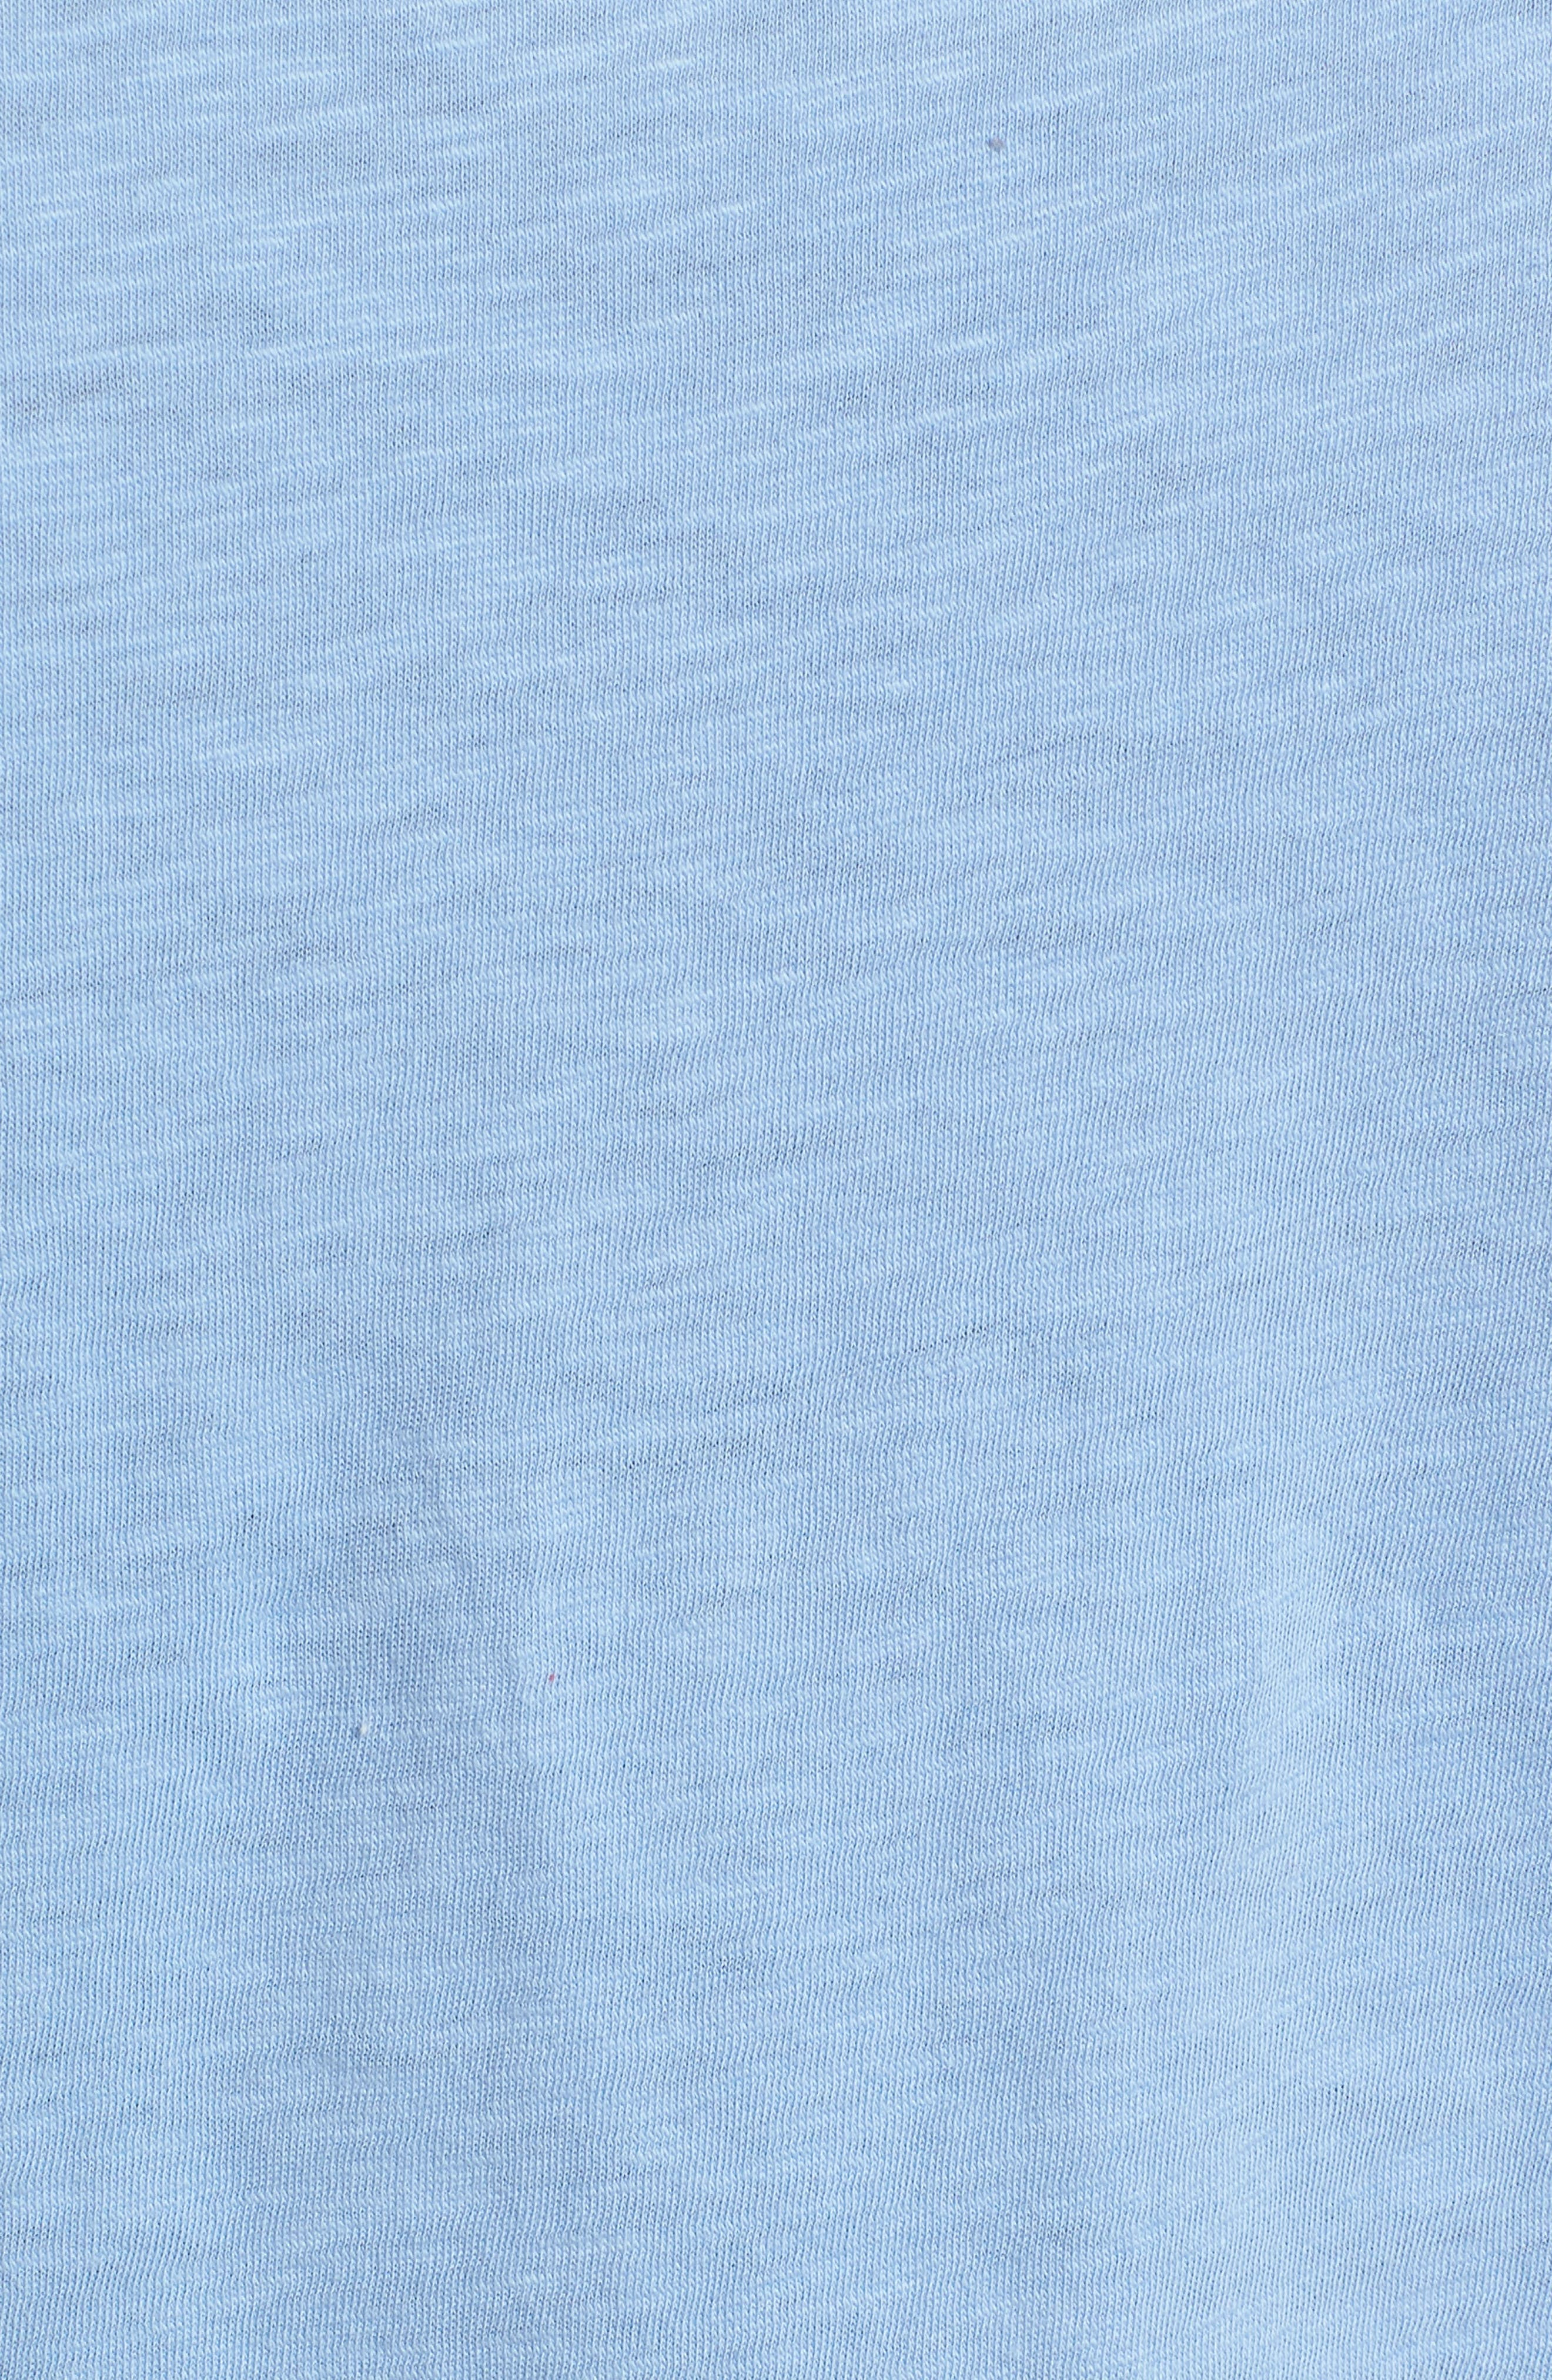 Tie Front Tee,                             Alternate thumbnail 6, color,                             Blue Bel Air